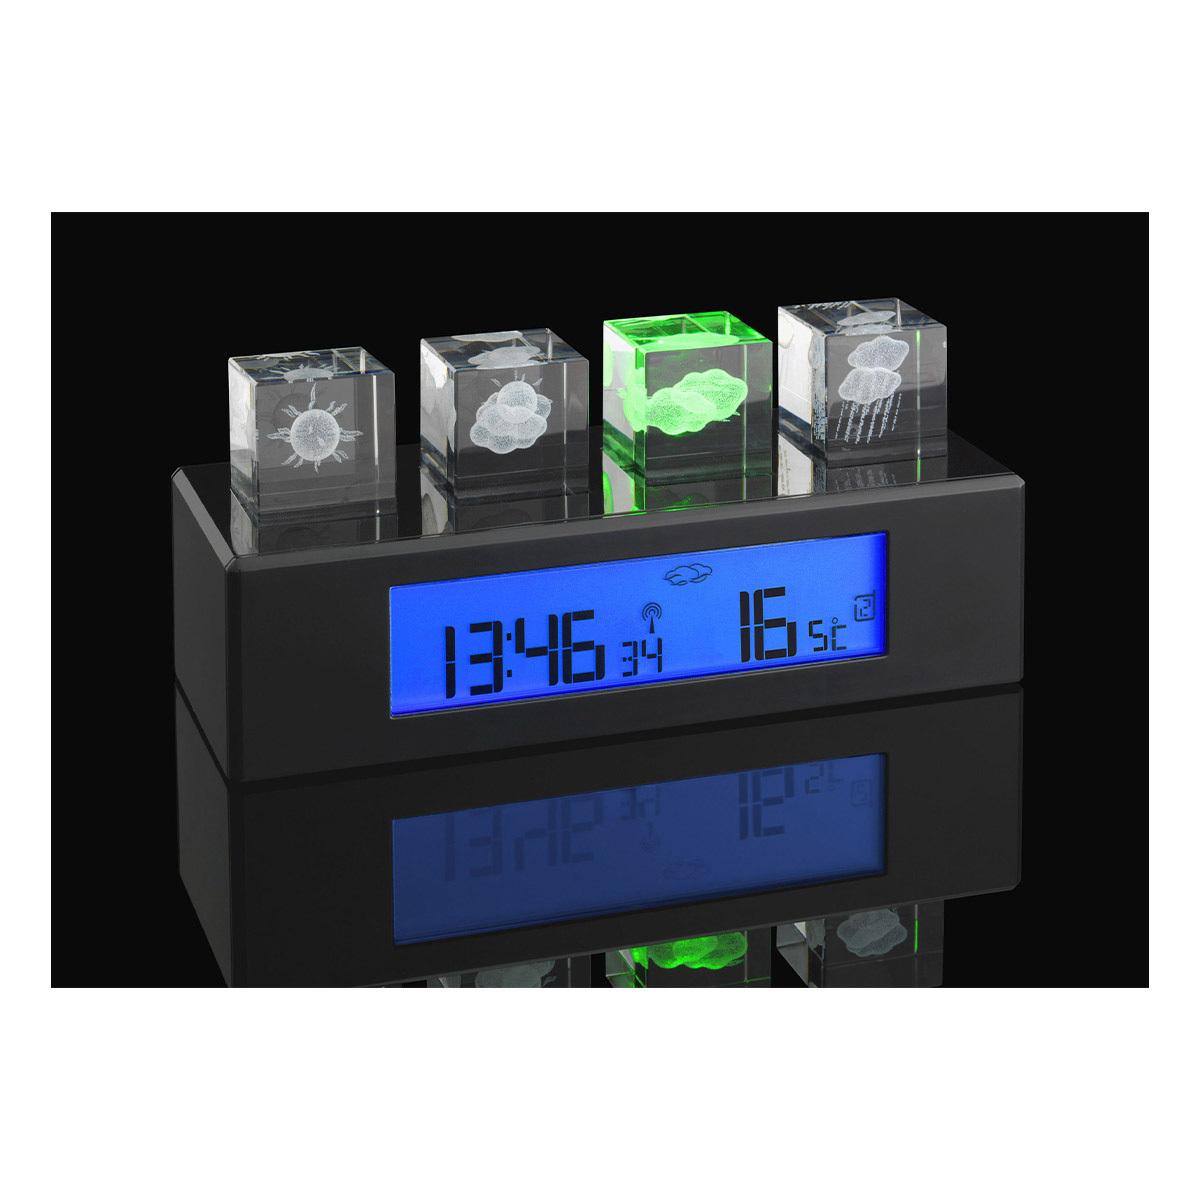 35-1110-funk-wetterstation-mit-3d-anzeige-crystal-cube-beleuchtung-1200x1200px.jpg